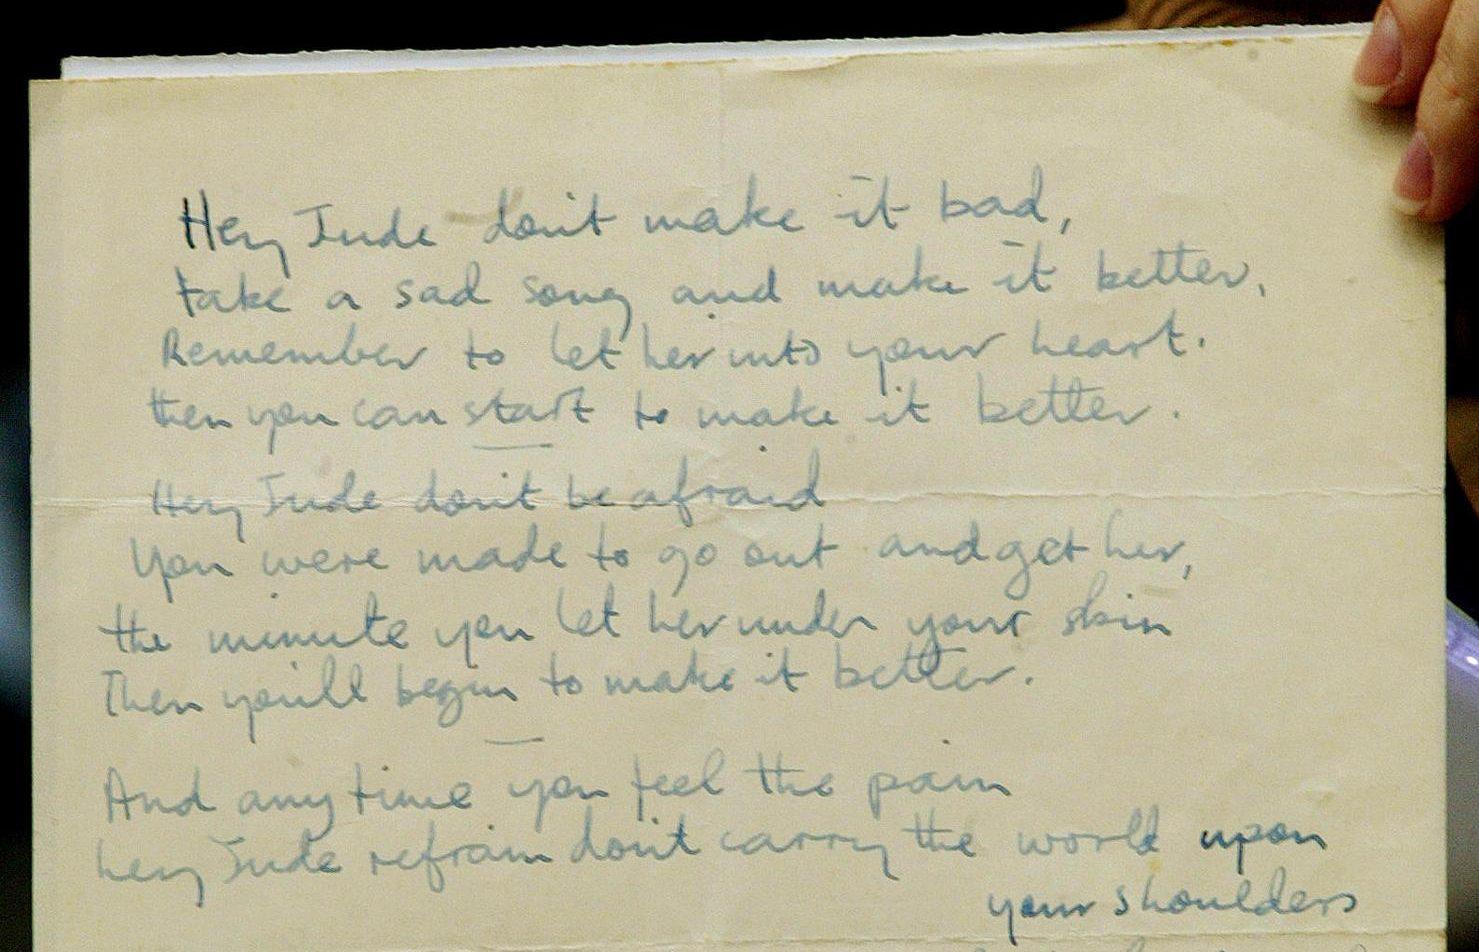 Hey Jude Handwritten lyrics